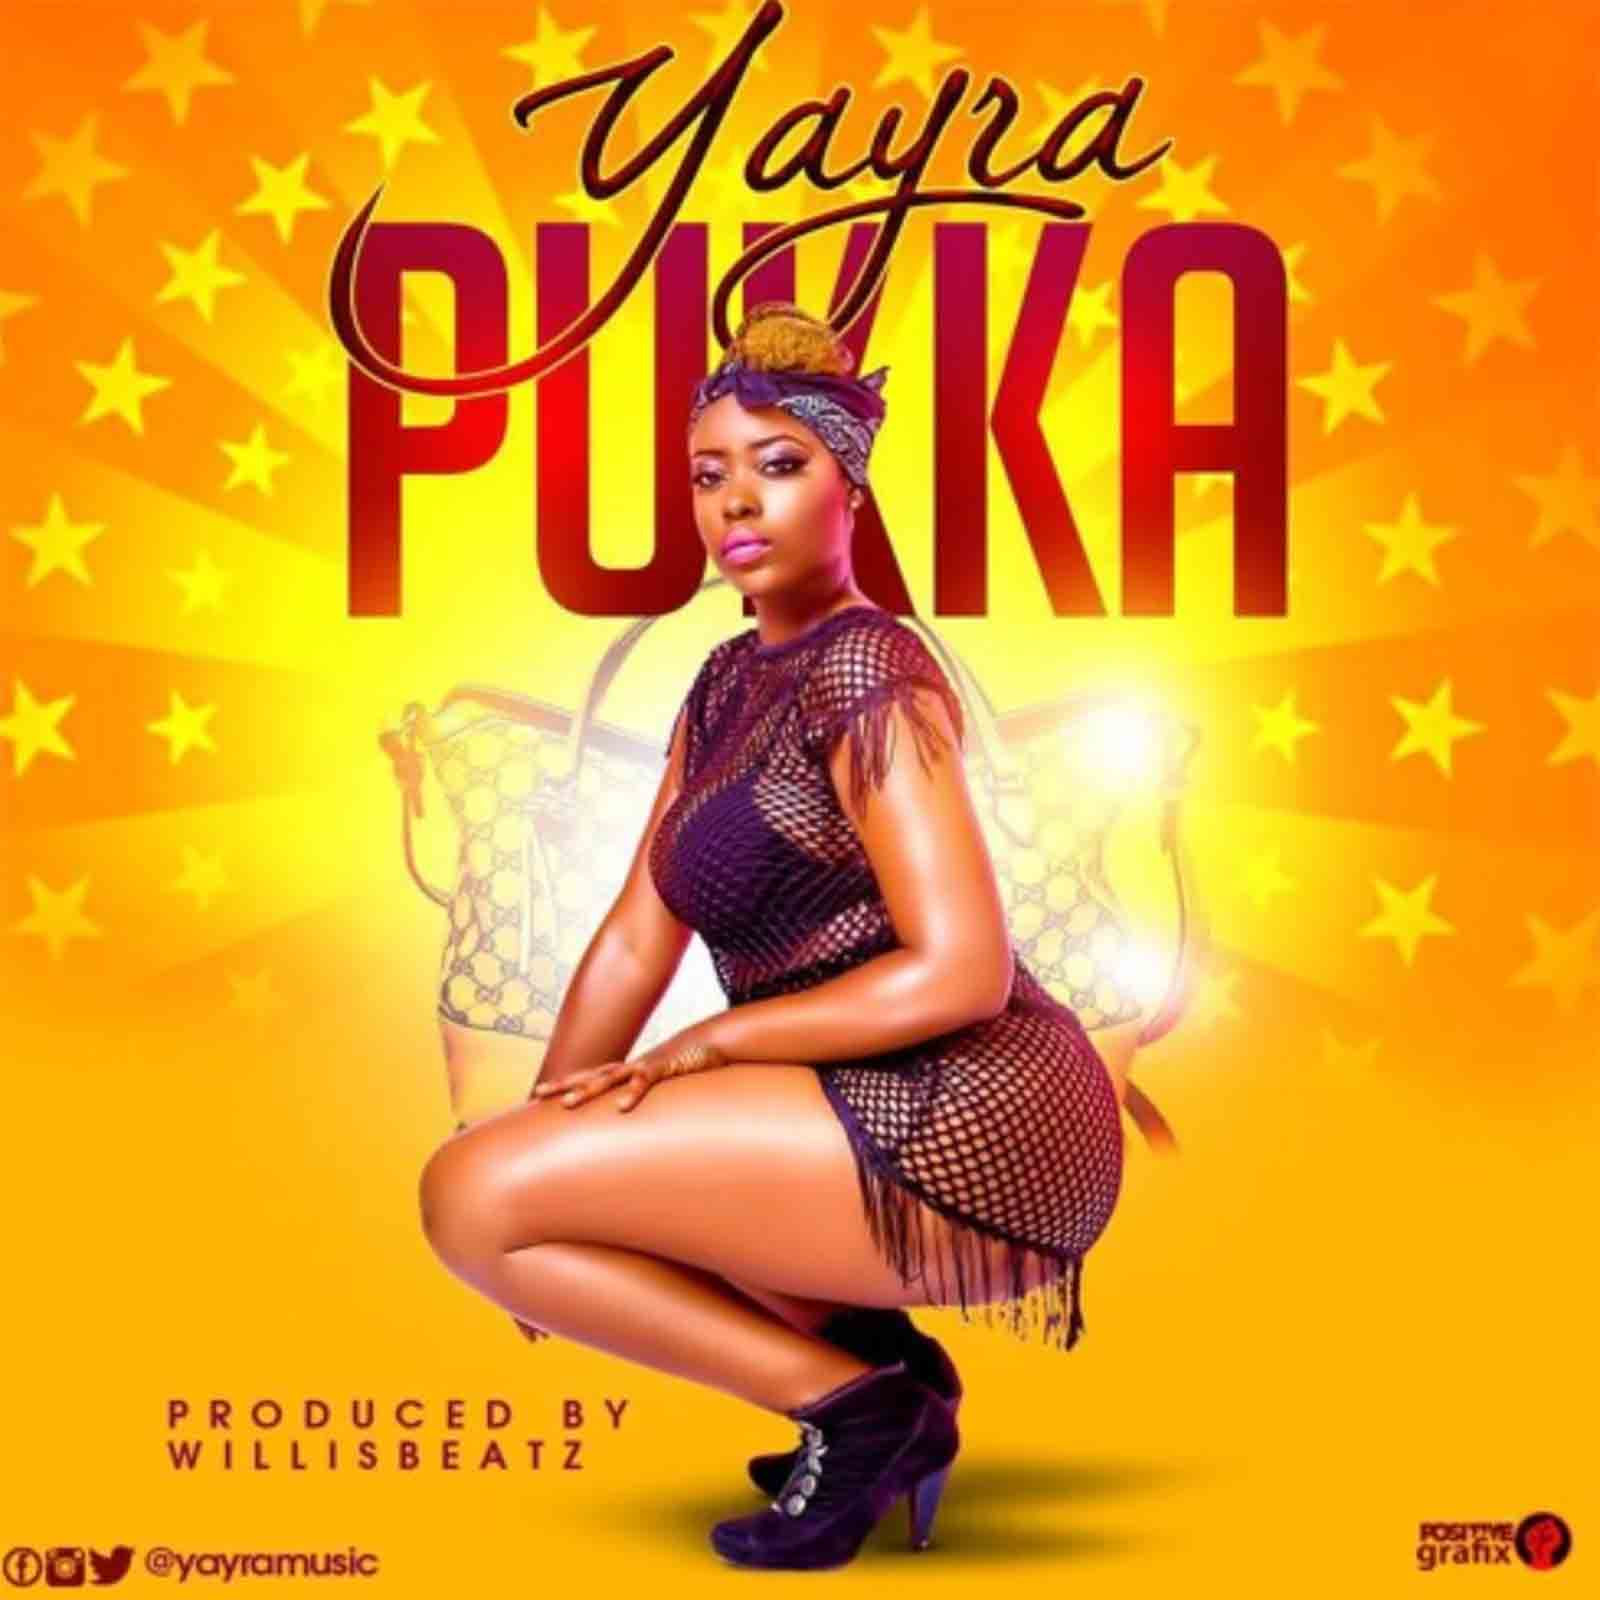 Pukka by Yayra